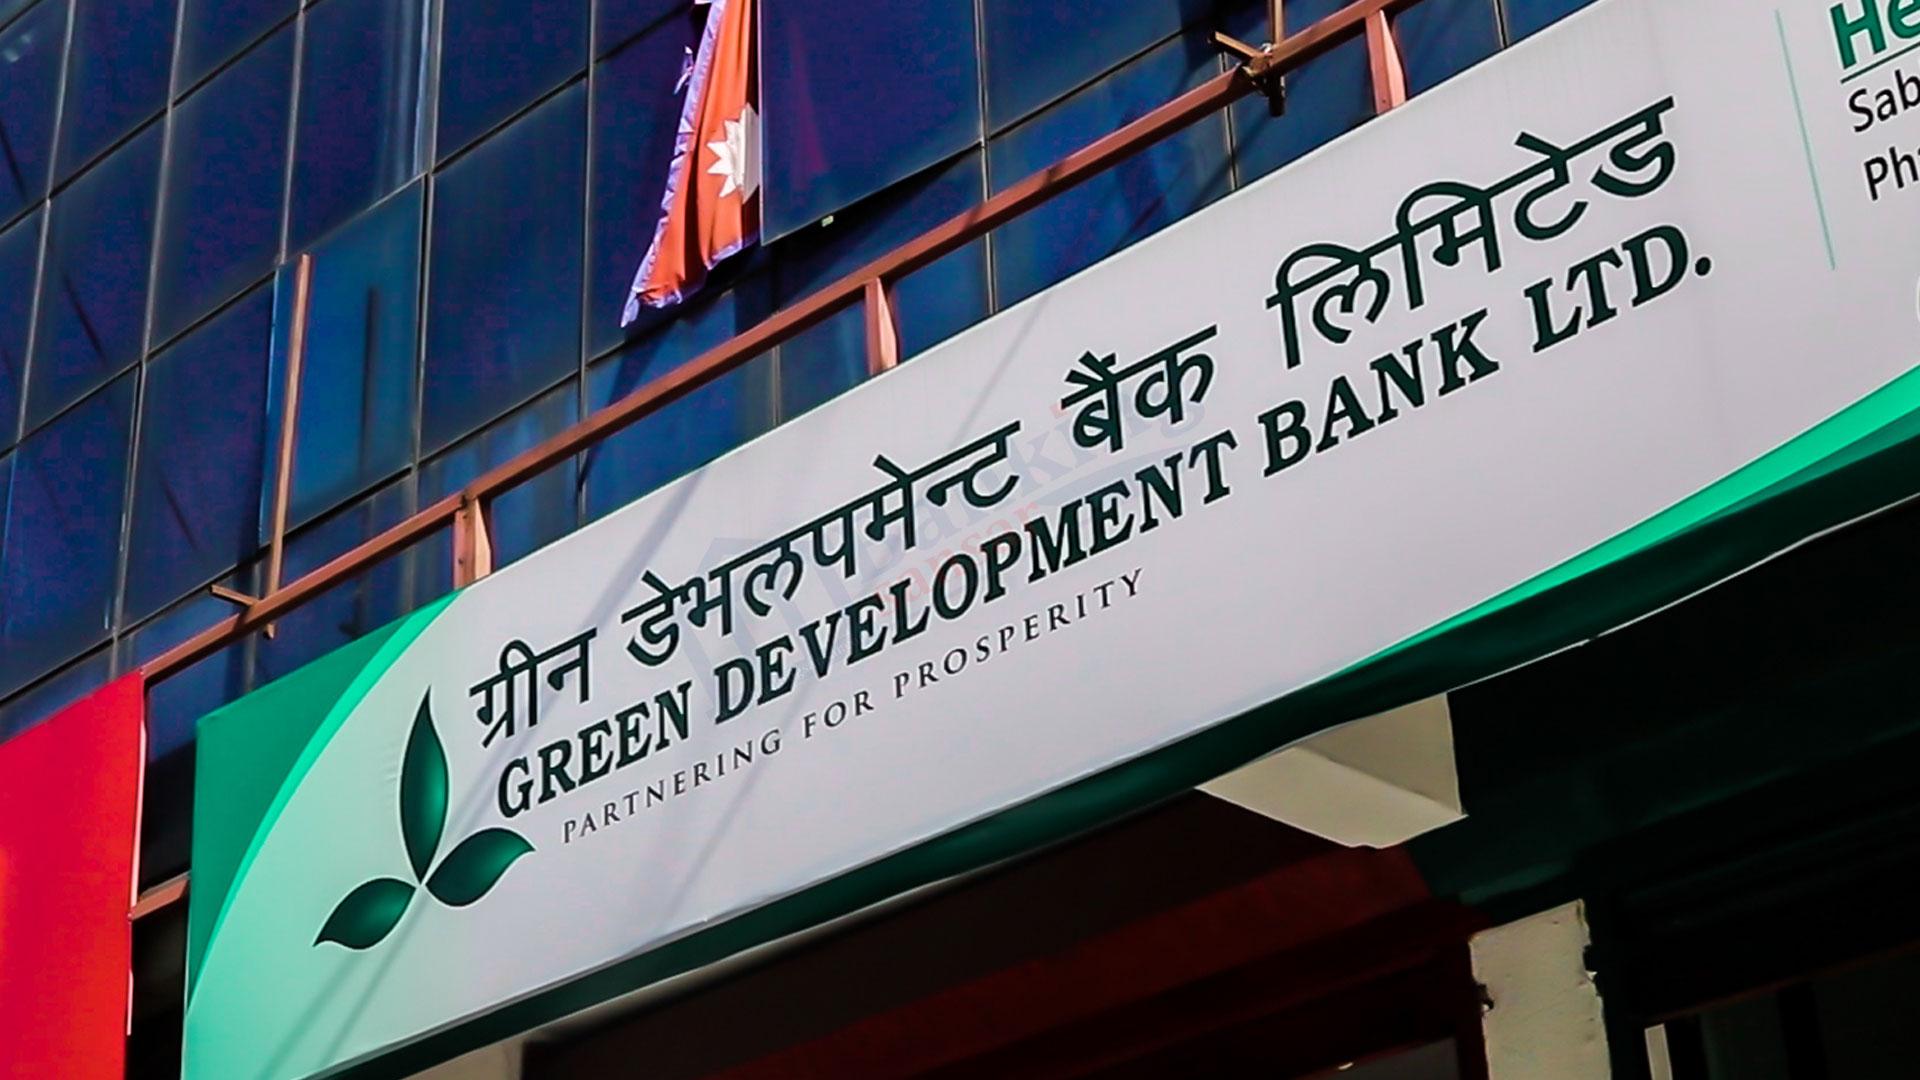 Green Development Bank